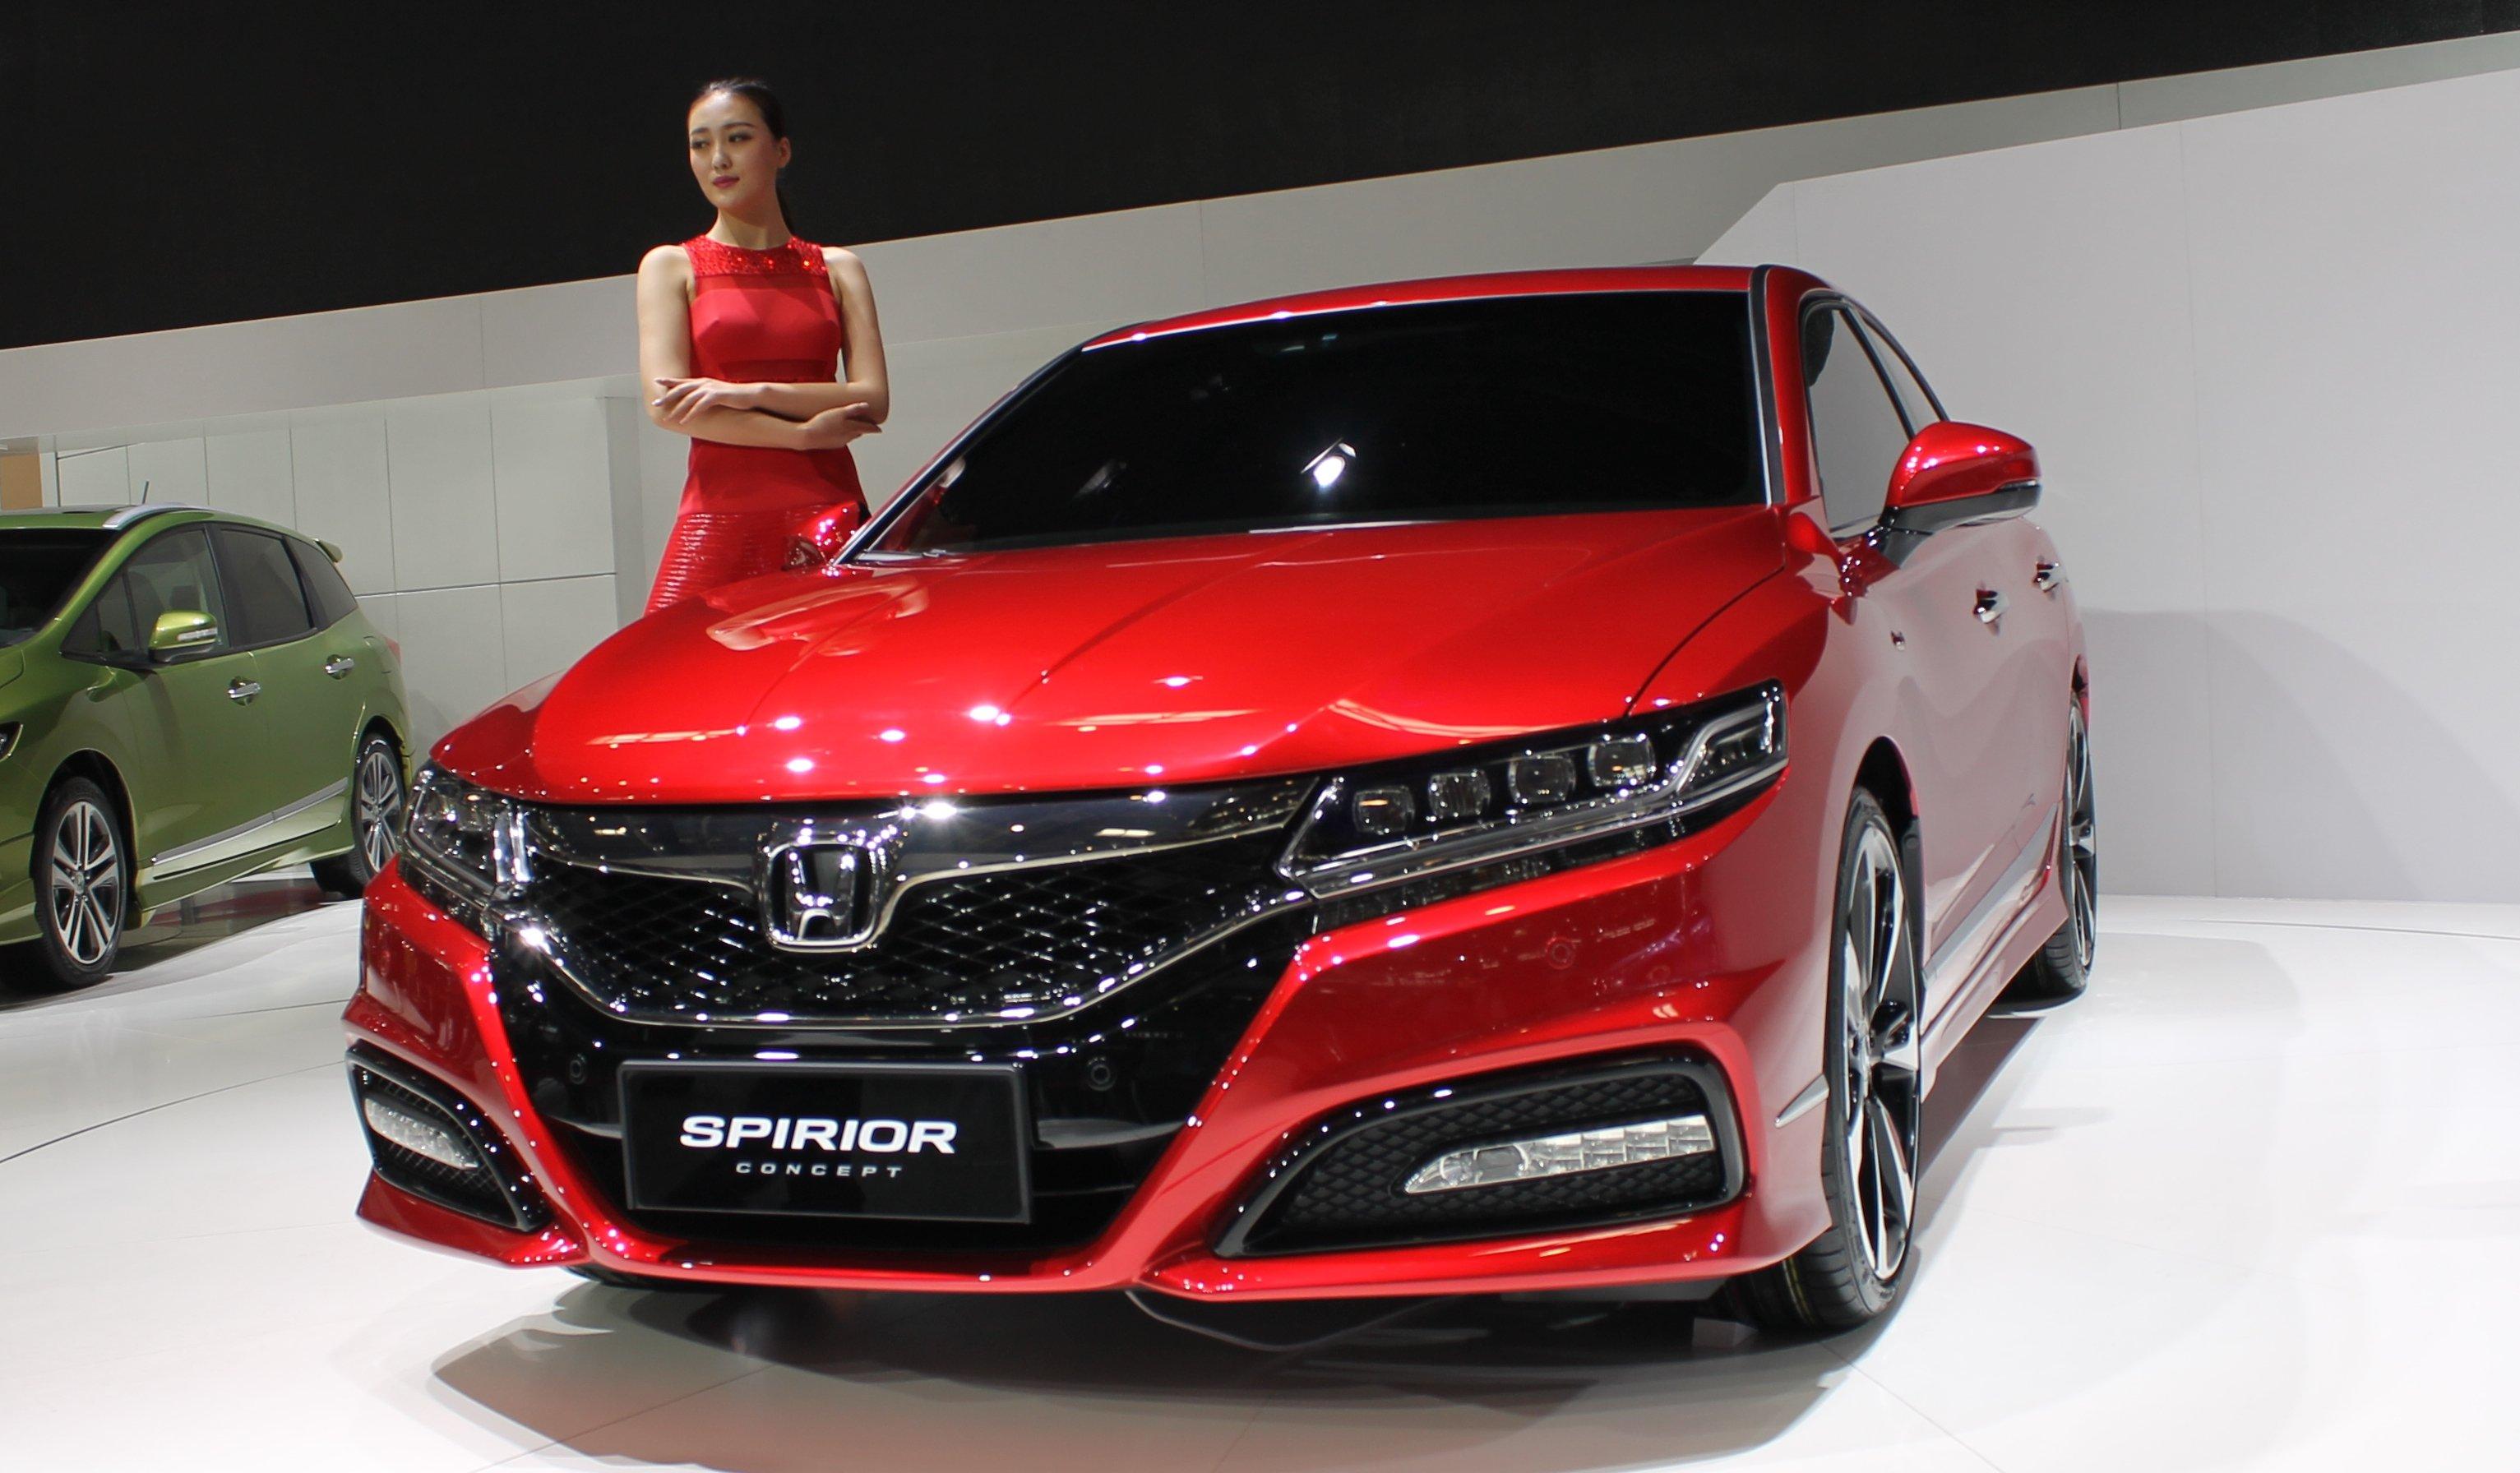 2015 Acura Tlx Tech >> Honda Spirior Concept unveiled at Auto China 2014